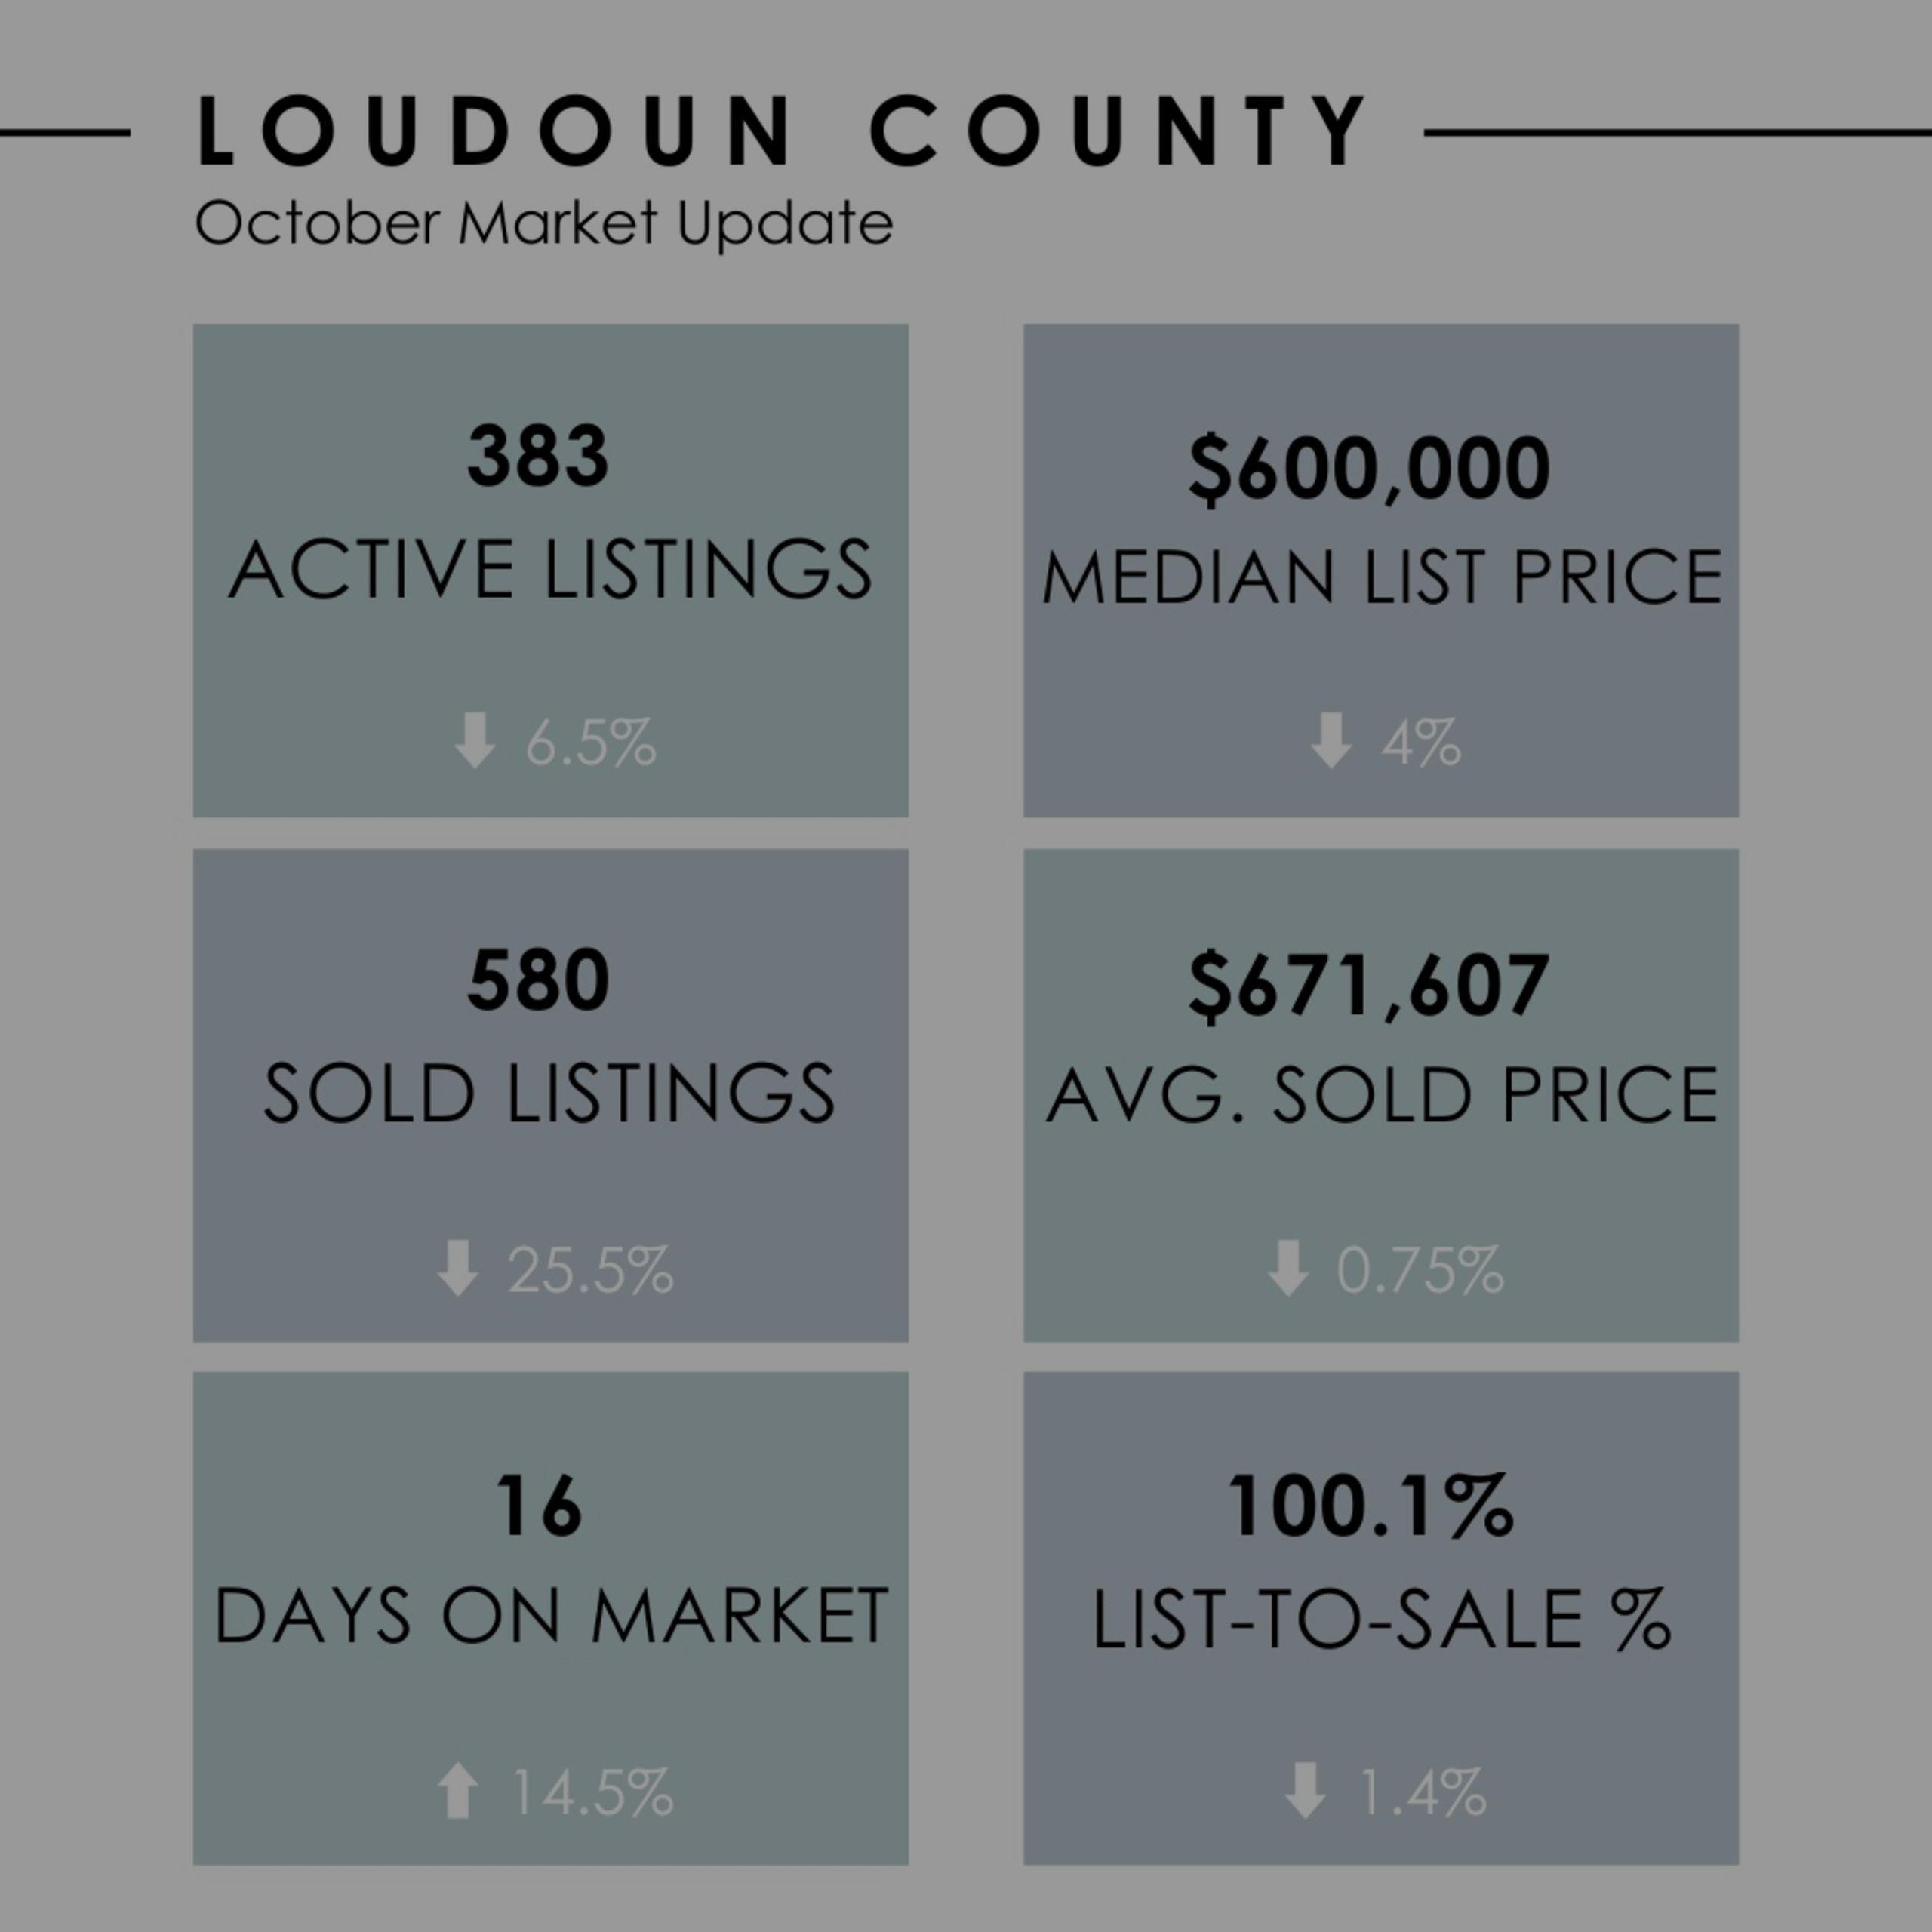 Loudoun County October Market Update